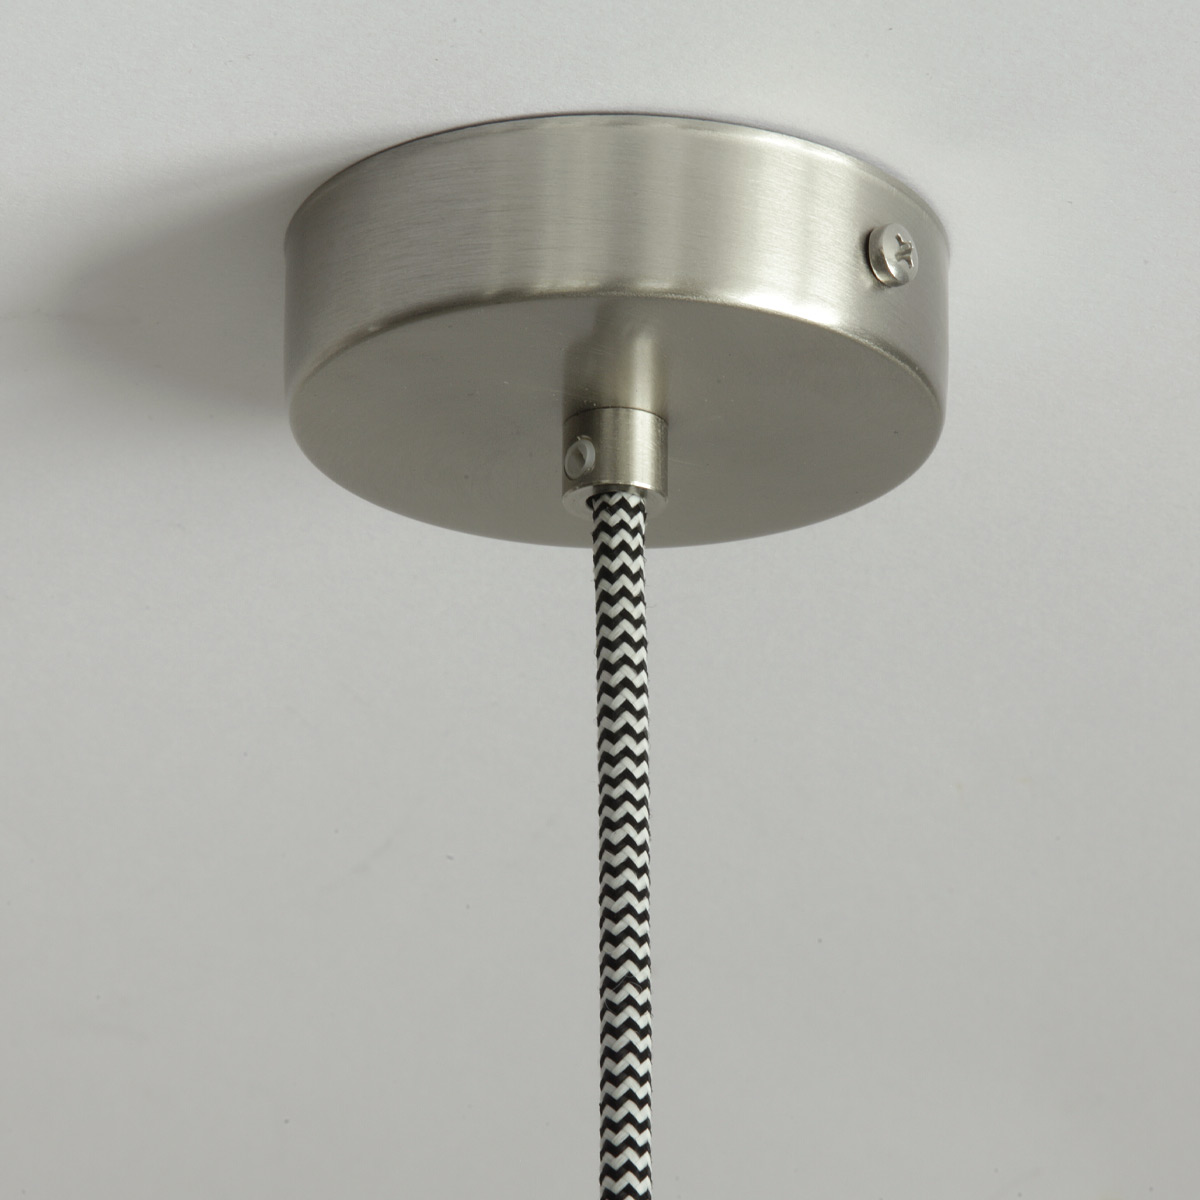 Concrete bulb holder pendulum lamp - Casa Lumi for Bulb Holder Design  110zmd